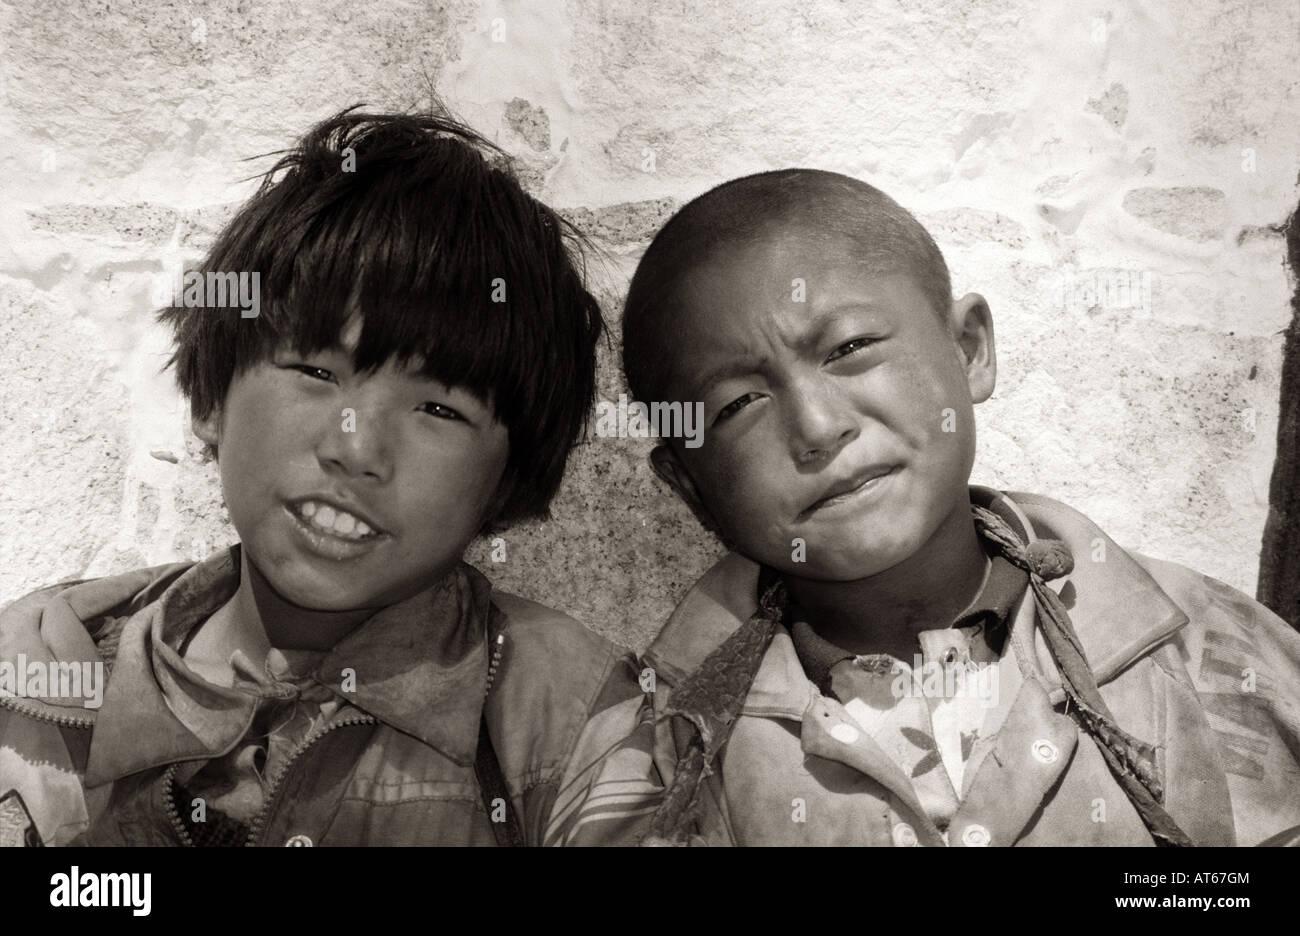 Tibetan boys, Lhasa - Stock Image